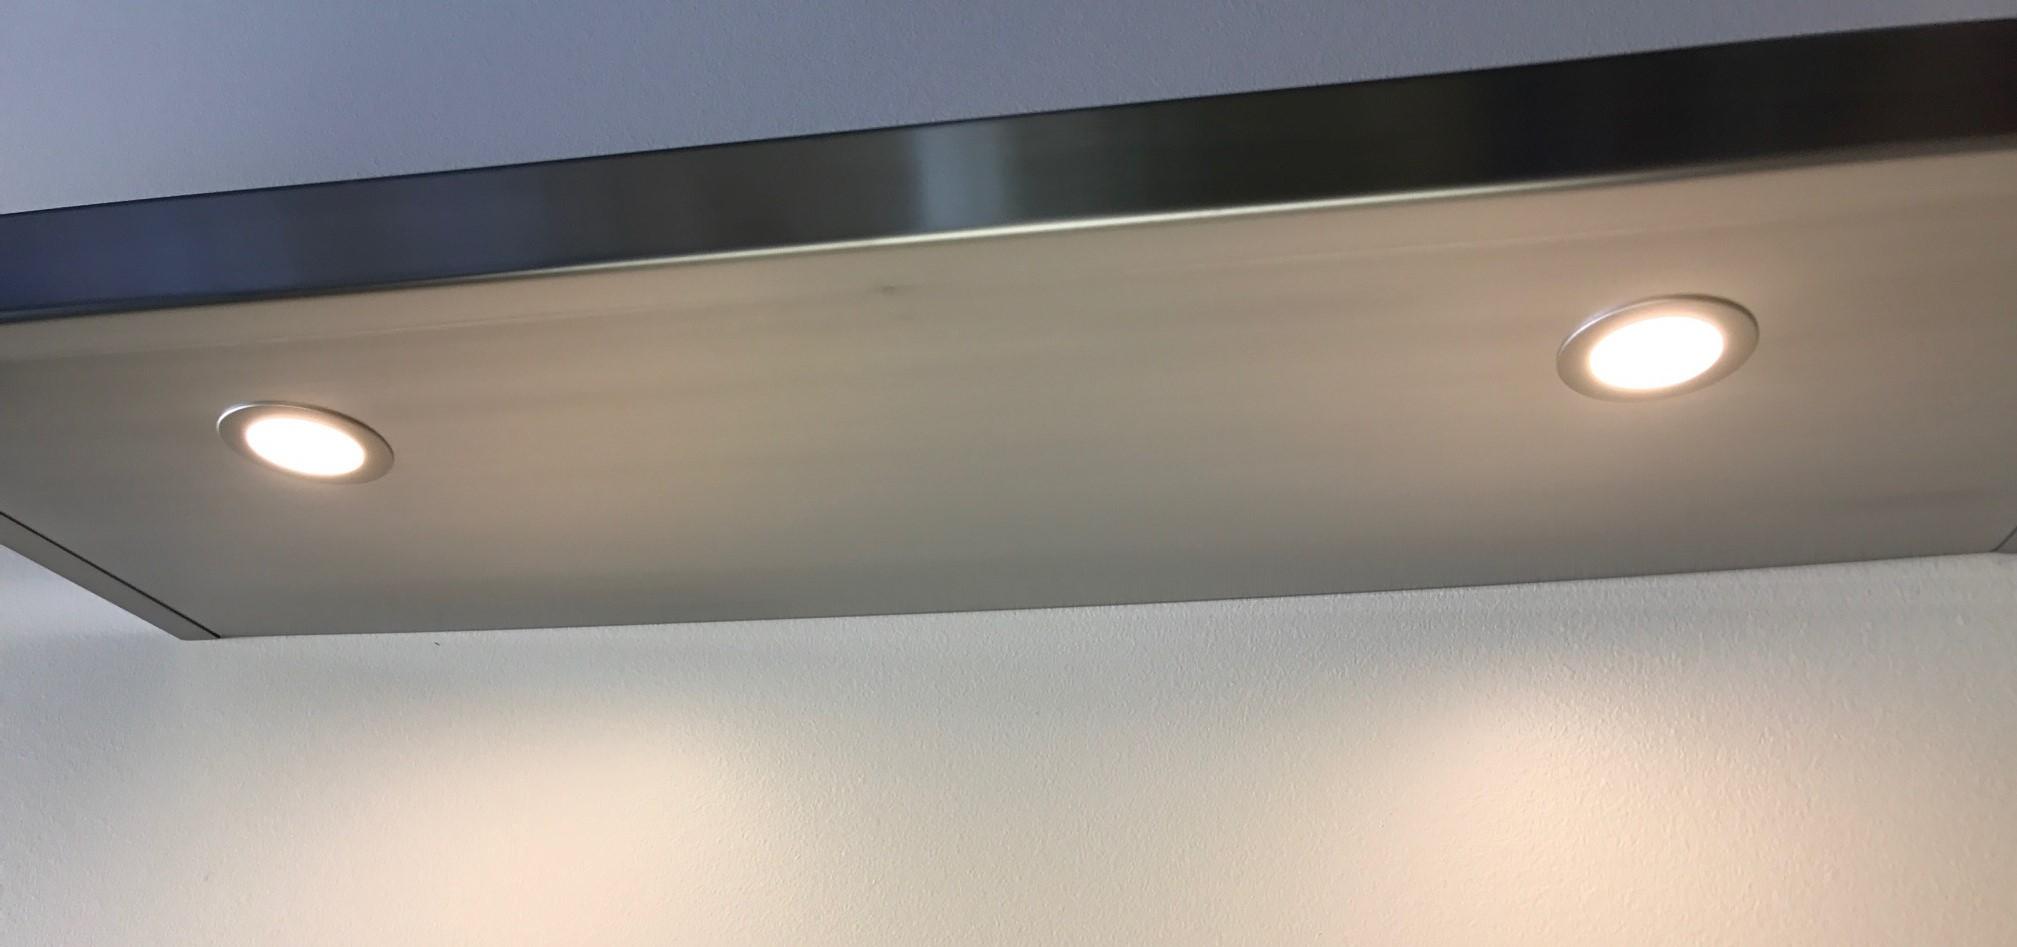 led lighting options for custom floating shelves img with stainless steel shelf recessed lights entry way coat hanger granite island brackets modern bathroom cabinet ideas